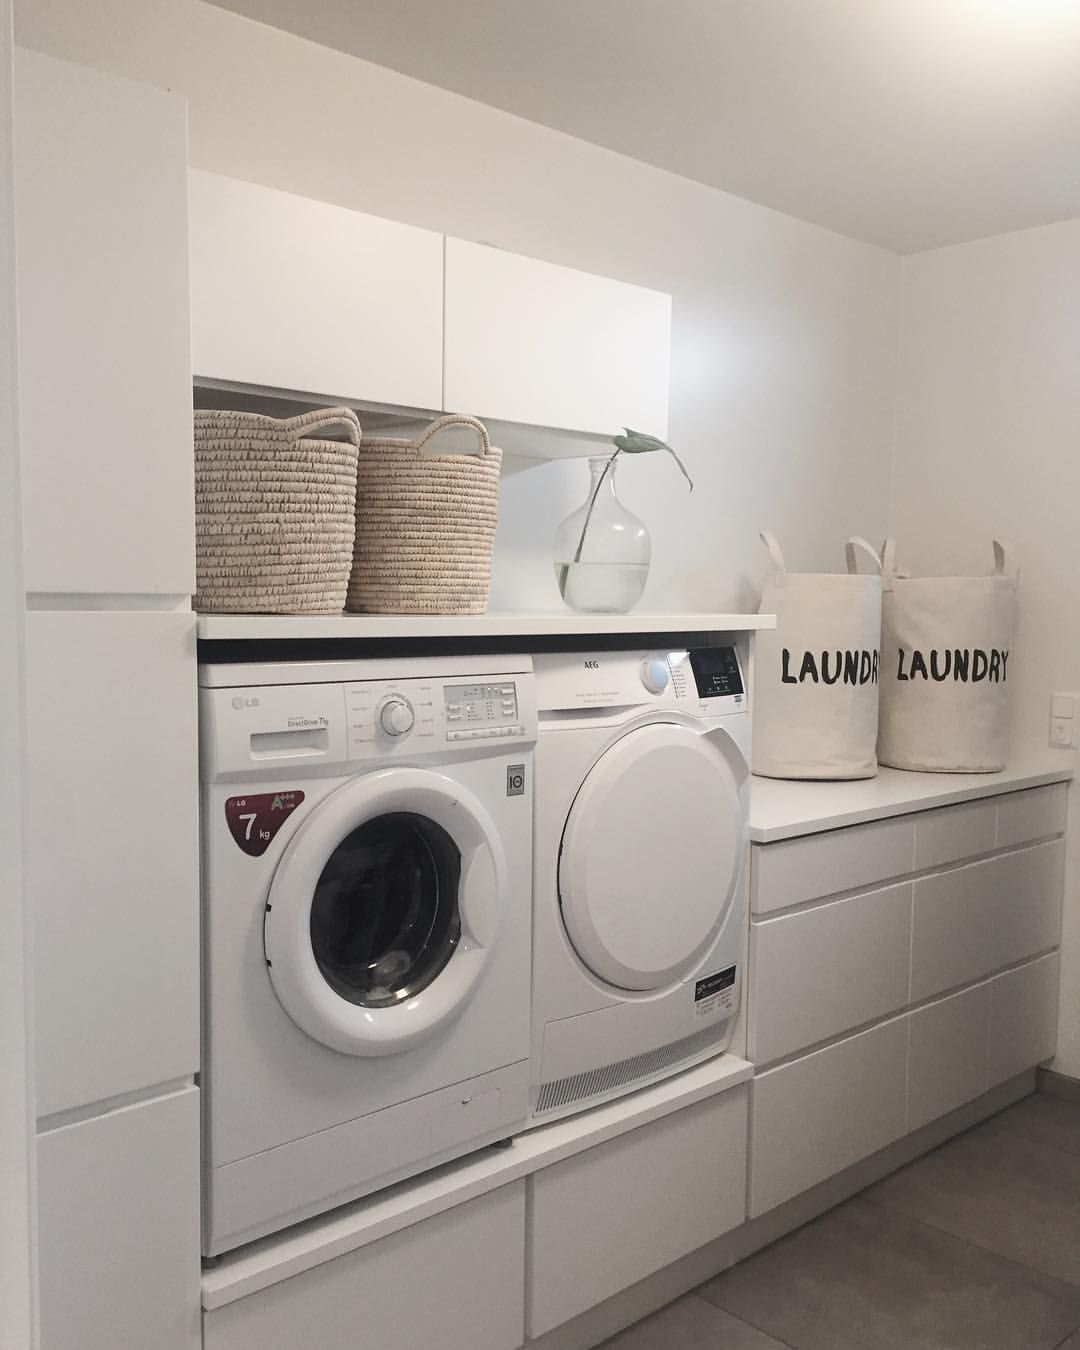 Heve vaskemaskinen?